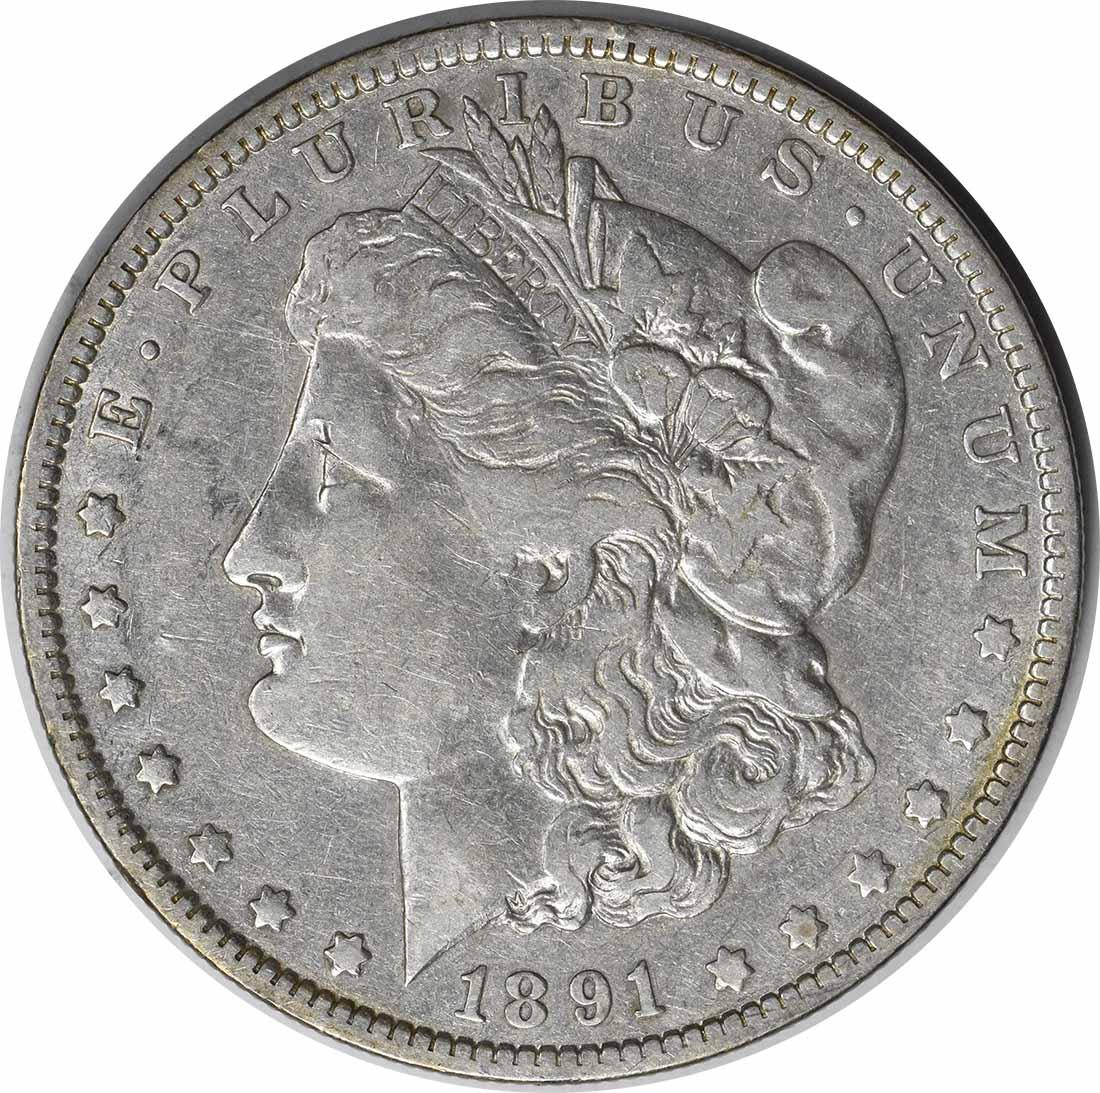 1891-O VAM 1A Morgan Silver Dollar Clashed E Choice VF Uncertified